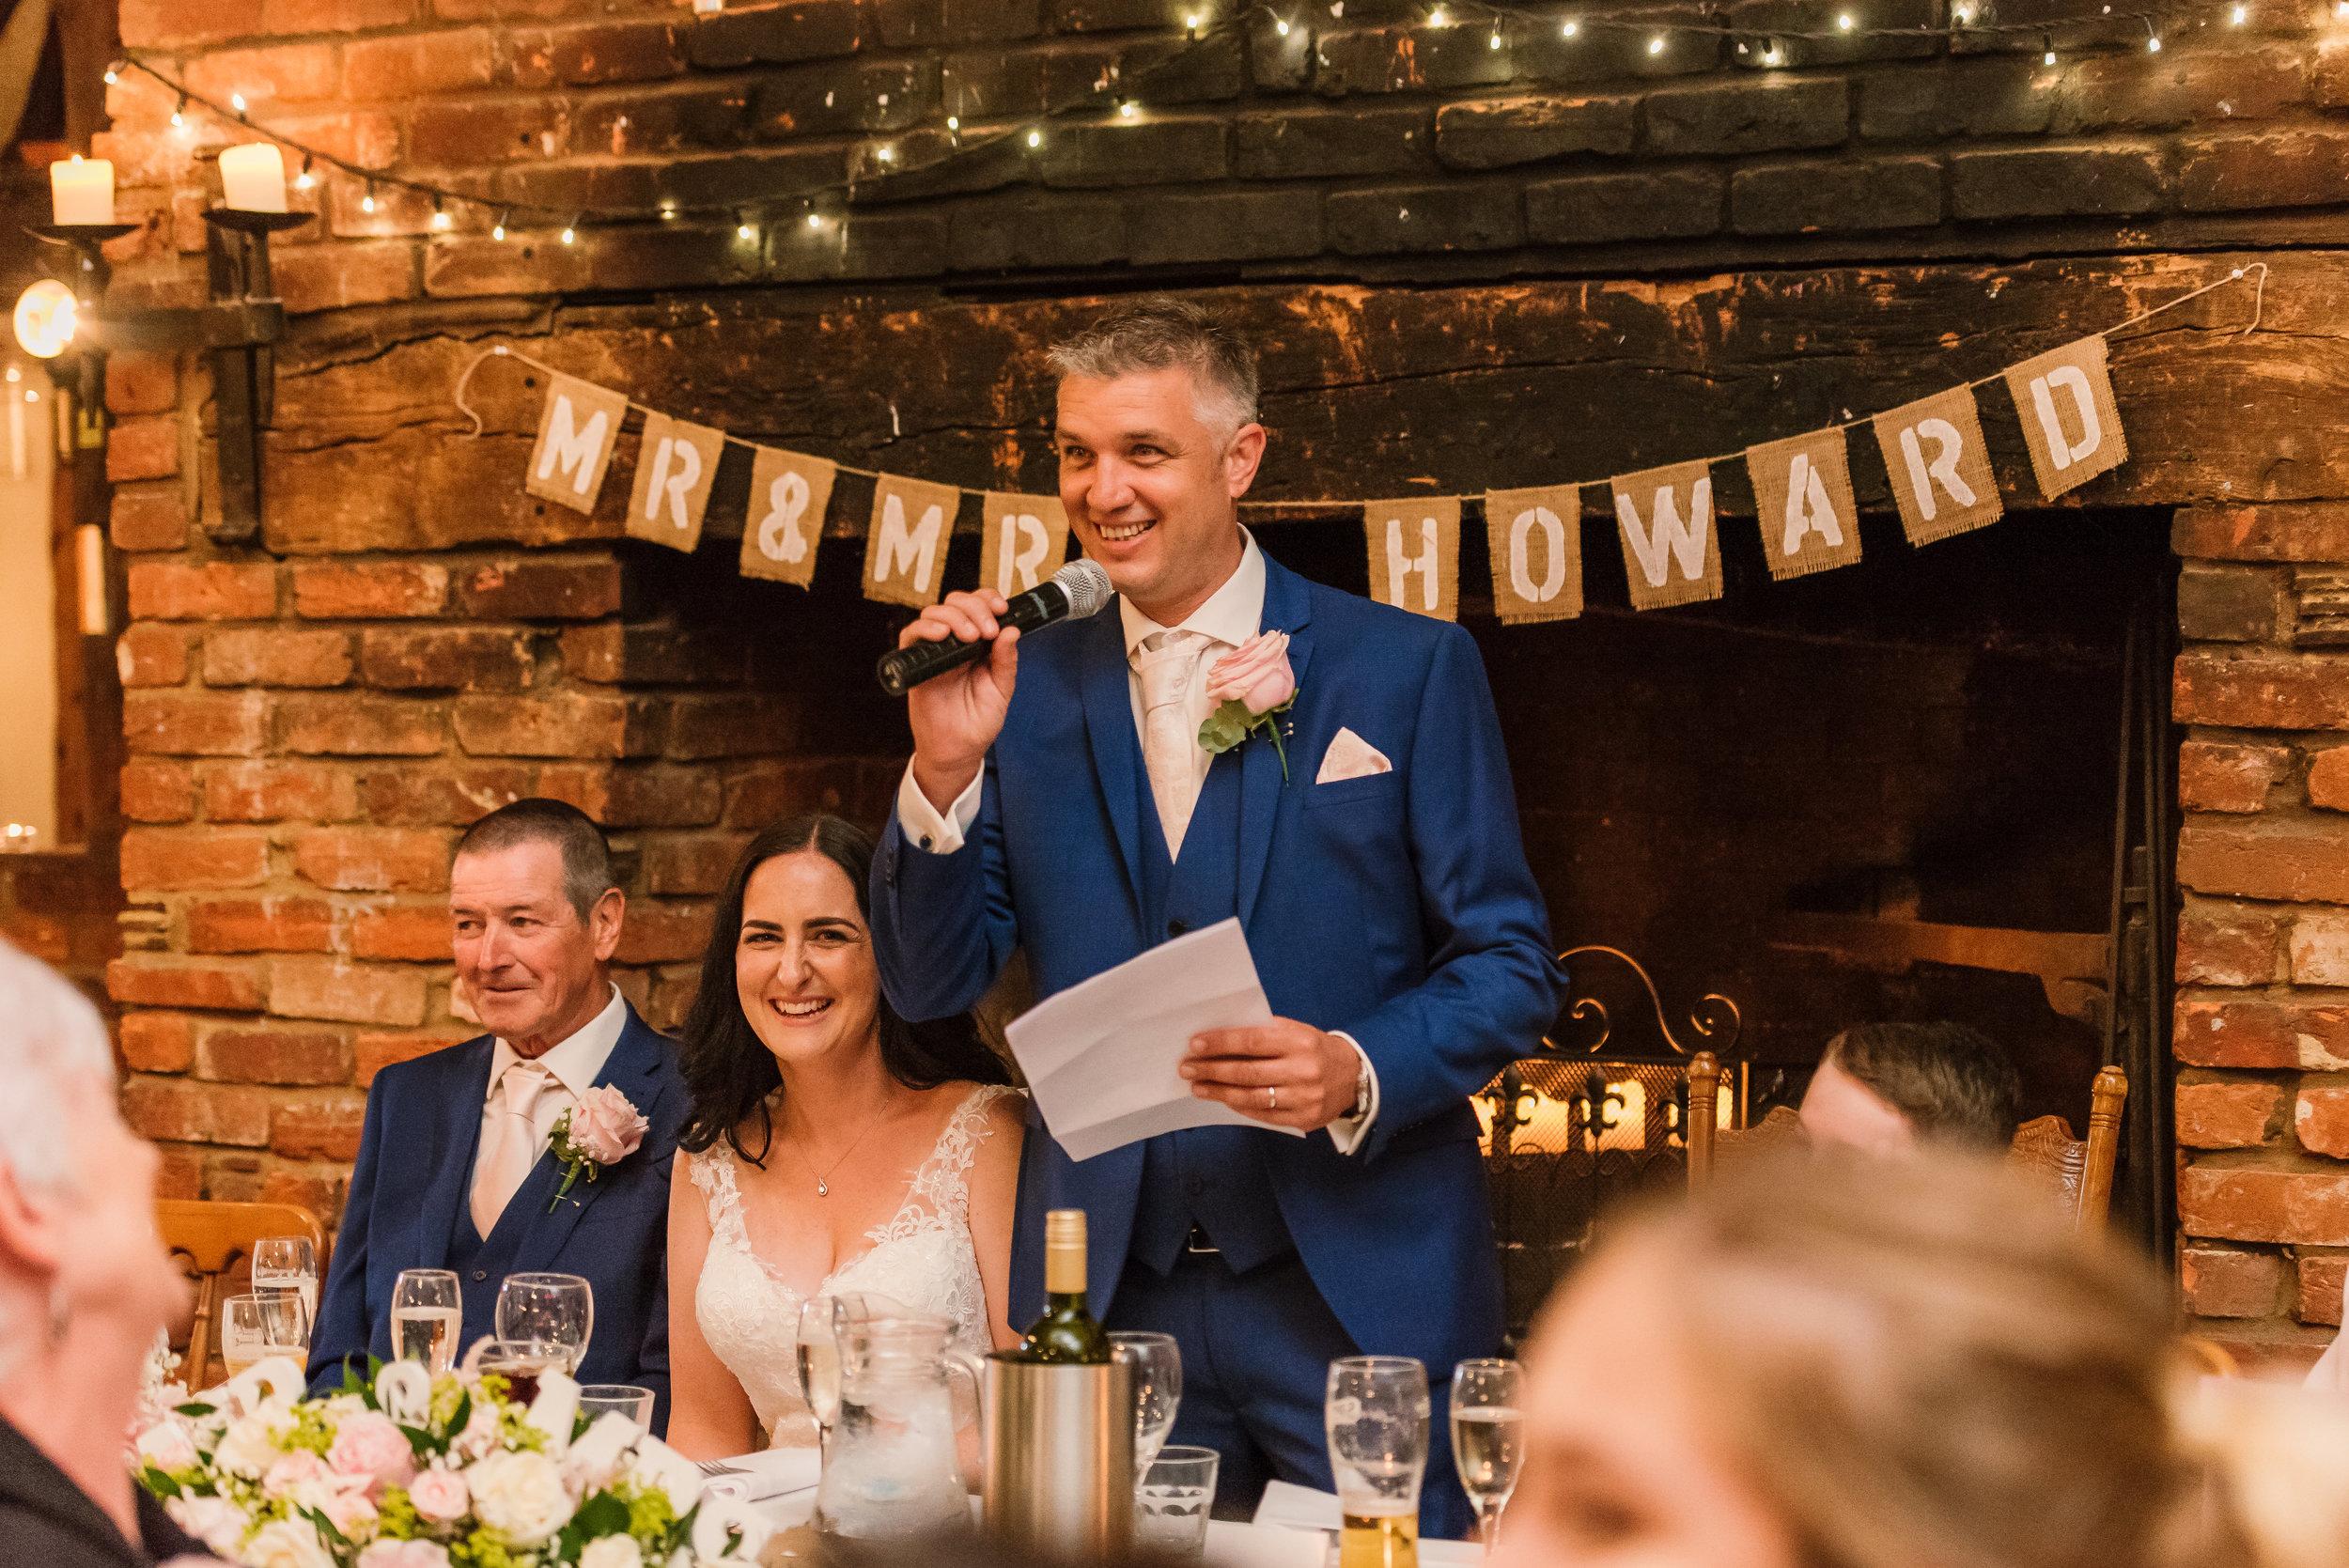 Sarah-Fishlock-Photography : Hampshire-wedding-photographer-hampshire : fleet-wedding-photographer-fleet : Meade-Hall-Wedding-Photographer : Meade-Hall-Wedding-Photos-828.jpg